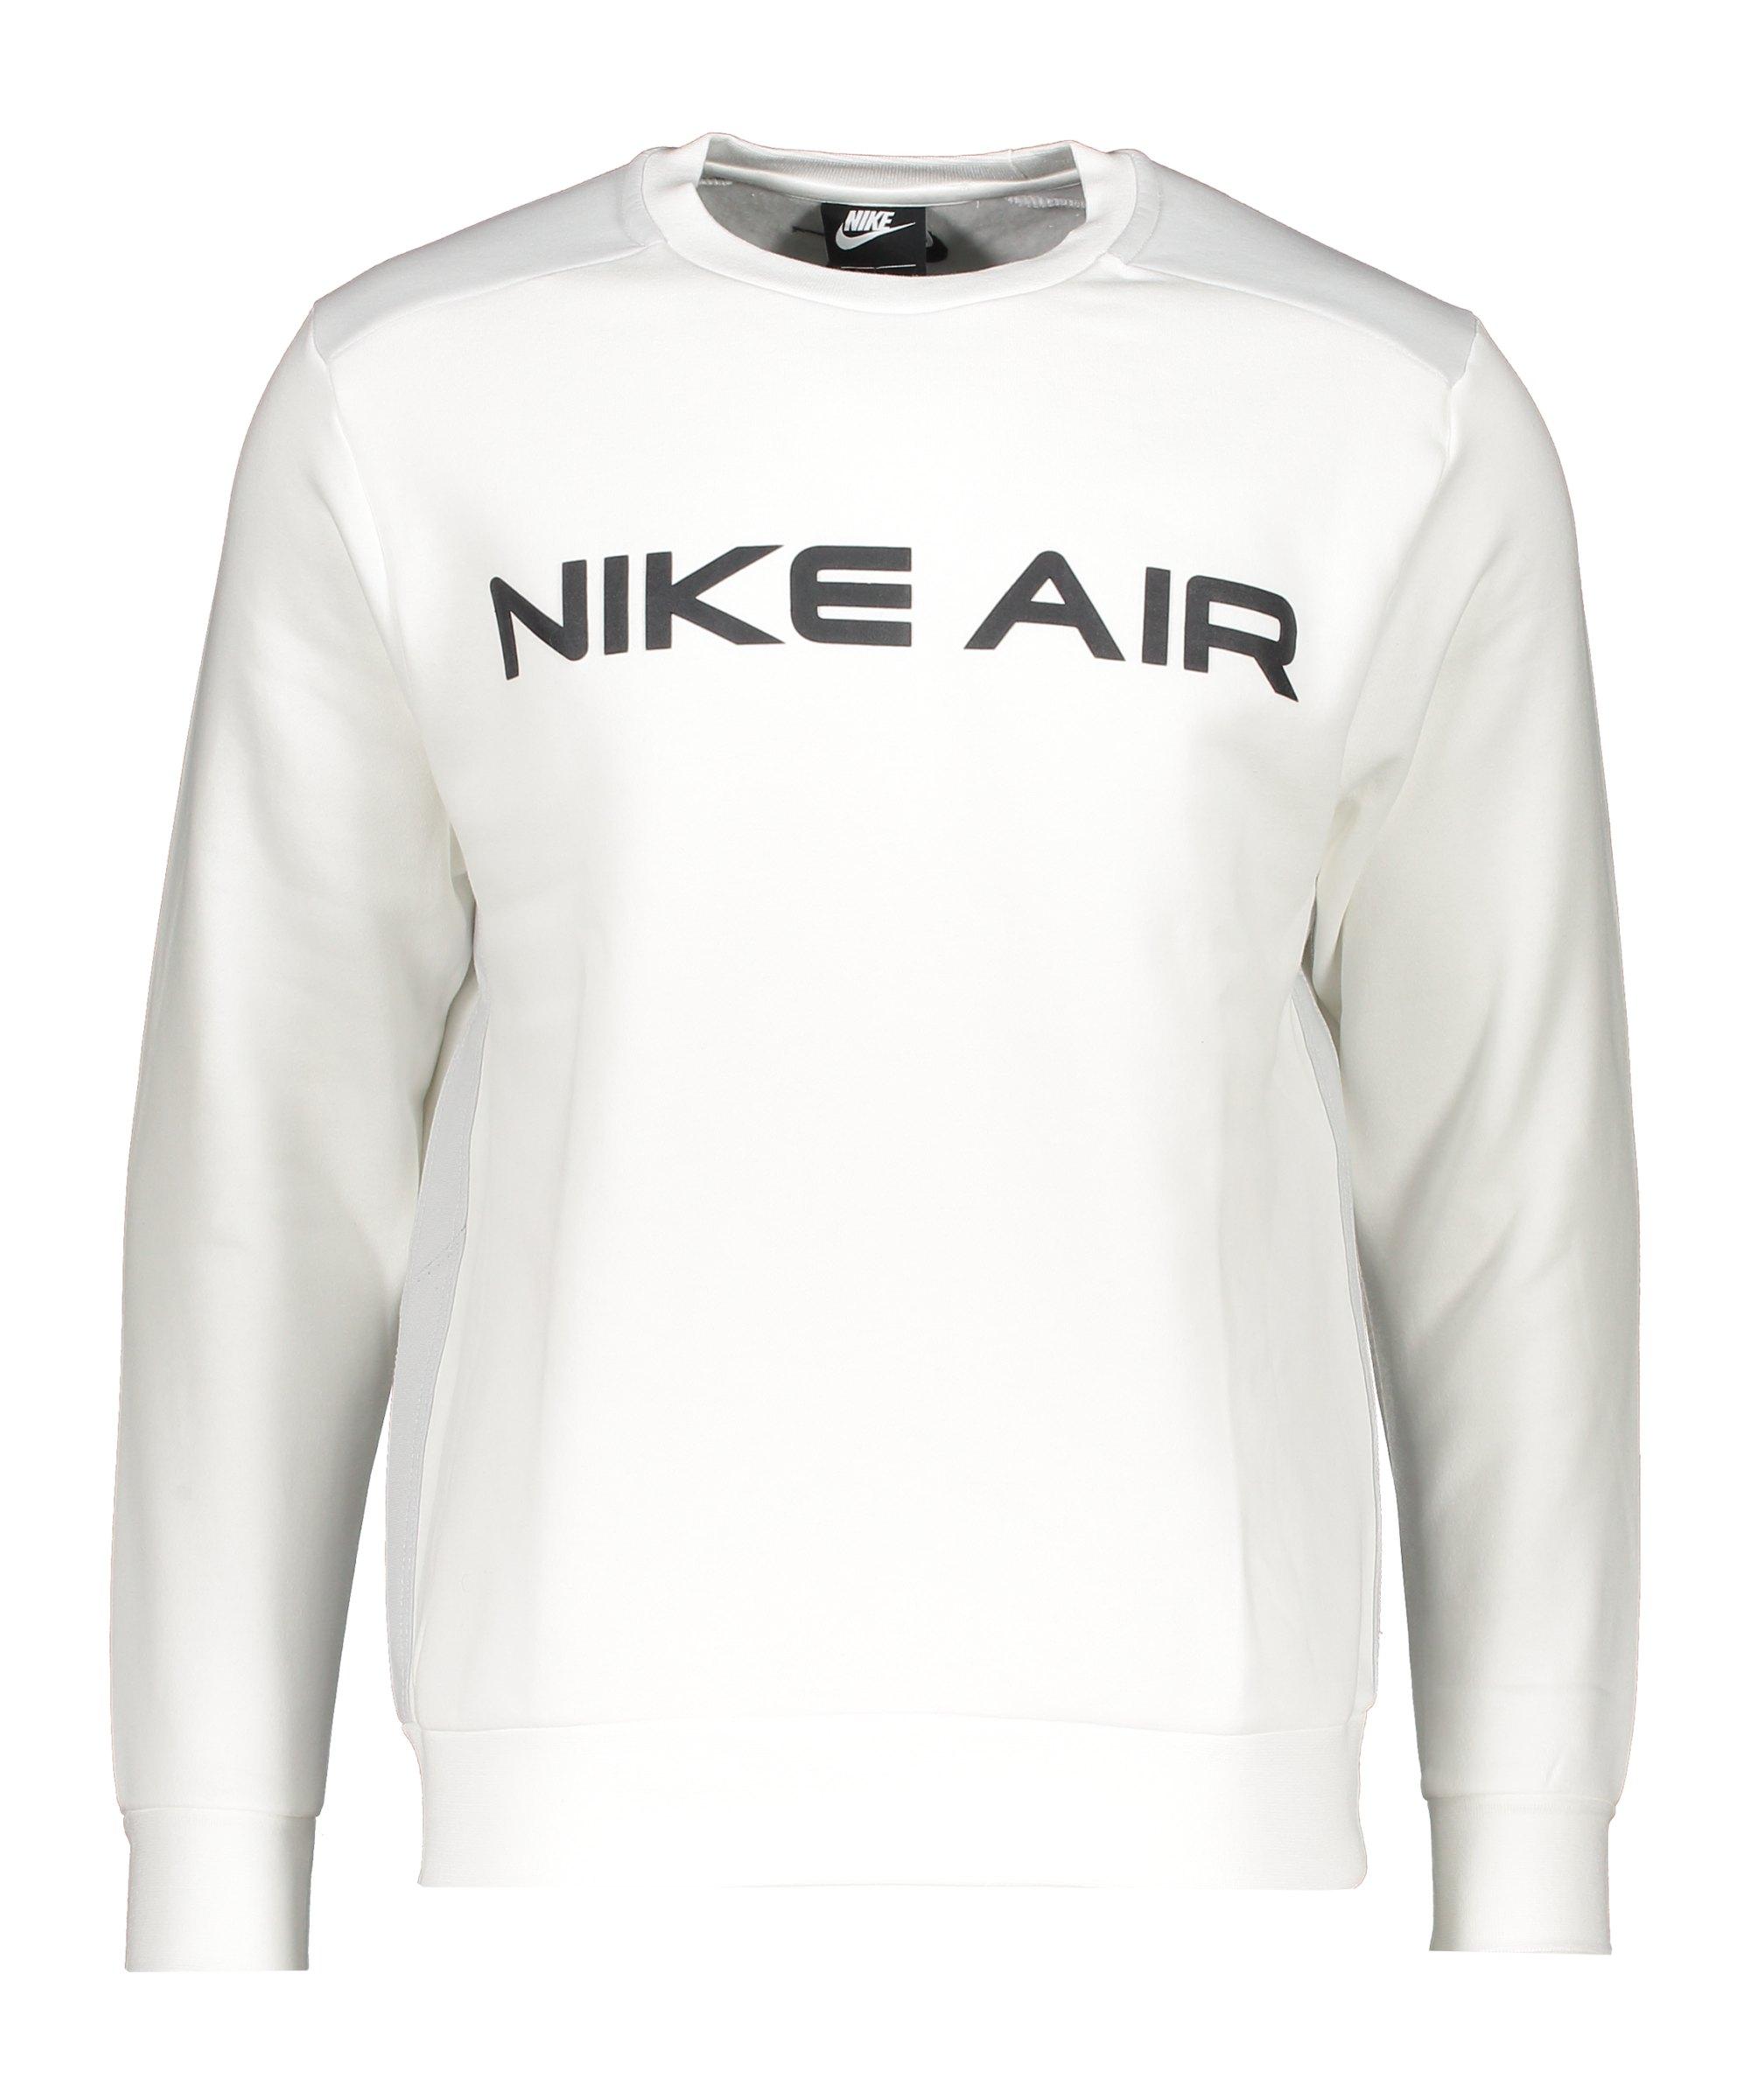 Nike Air Fleece Sweatshirt Weiss Grau F100 - weiss